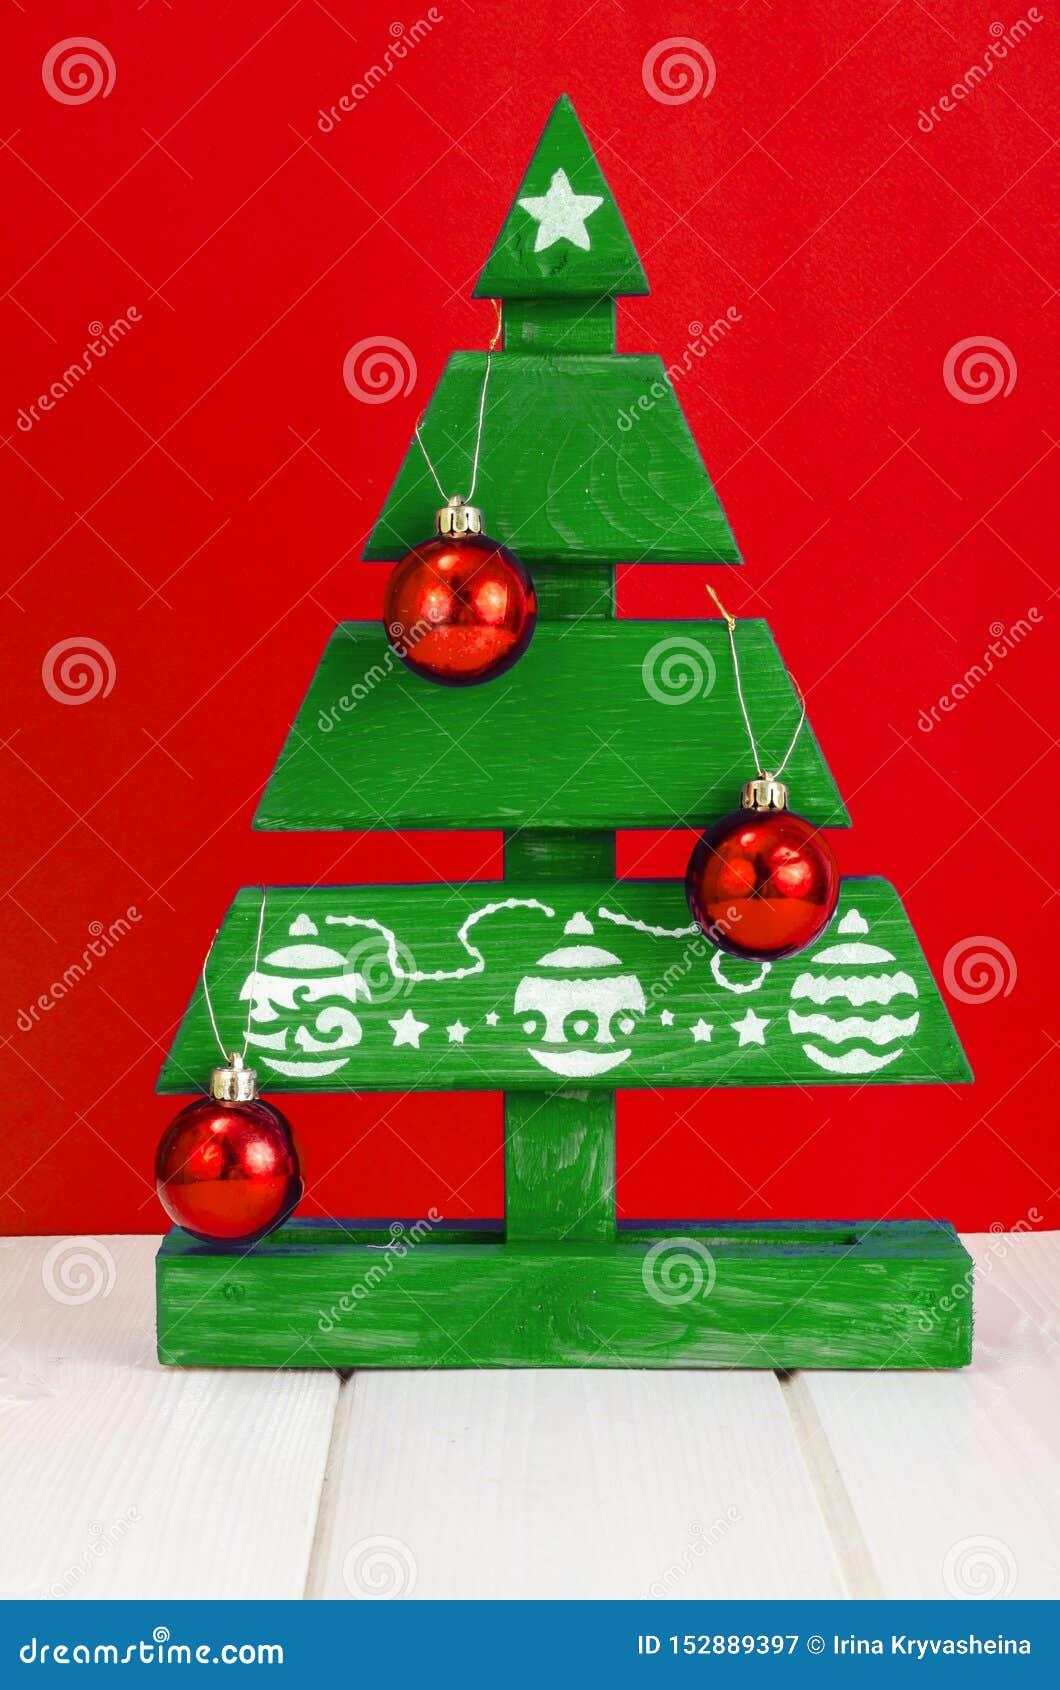 Handmade Wooden Christmas Tree Painted Blue Paint Stock Image Image Of Brush Garland 152889397